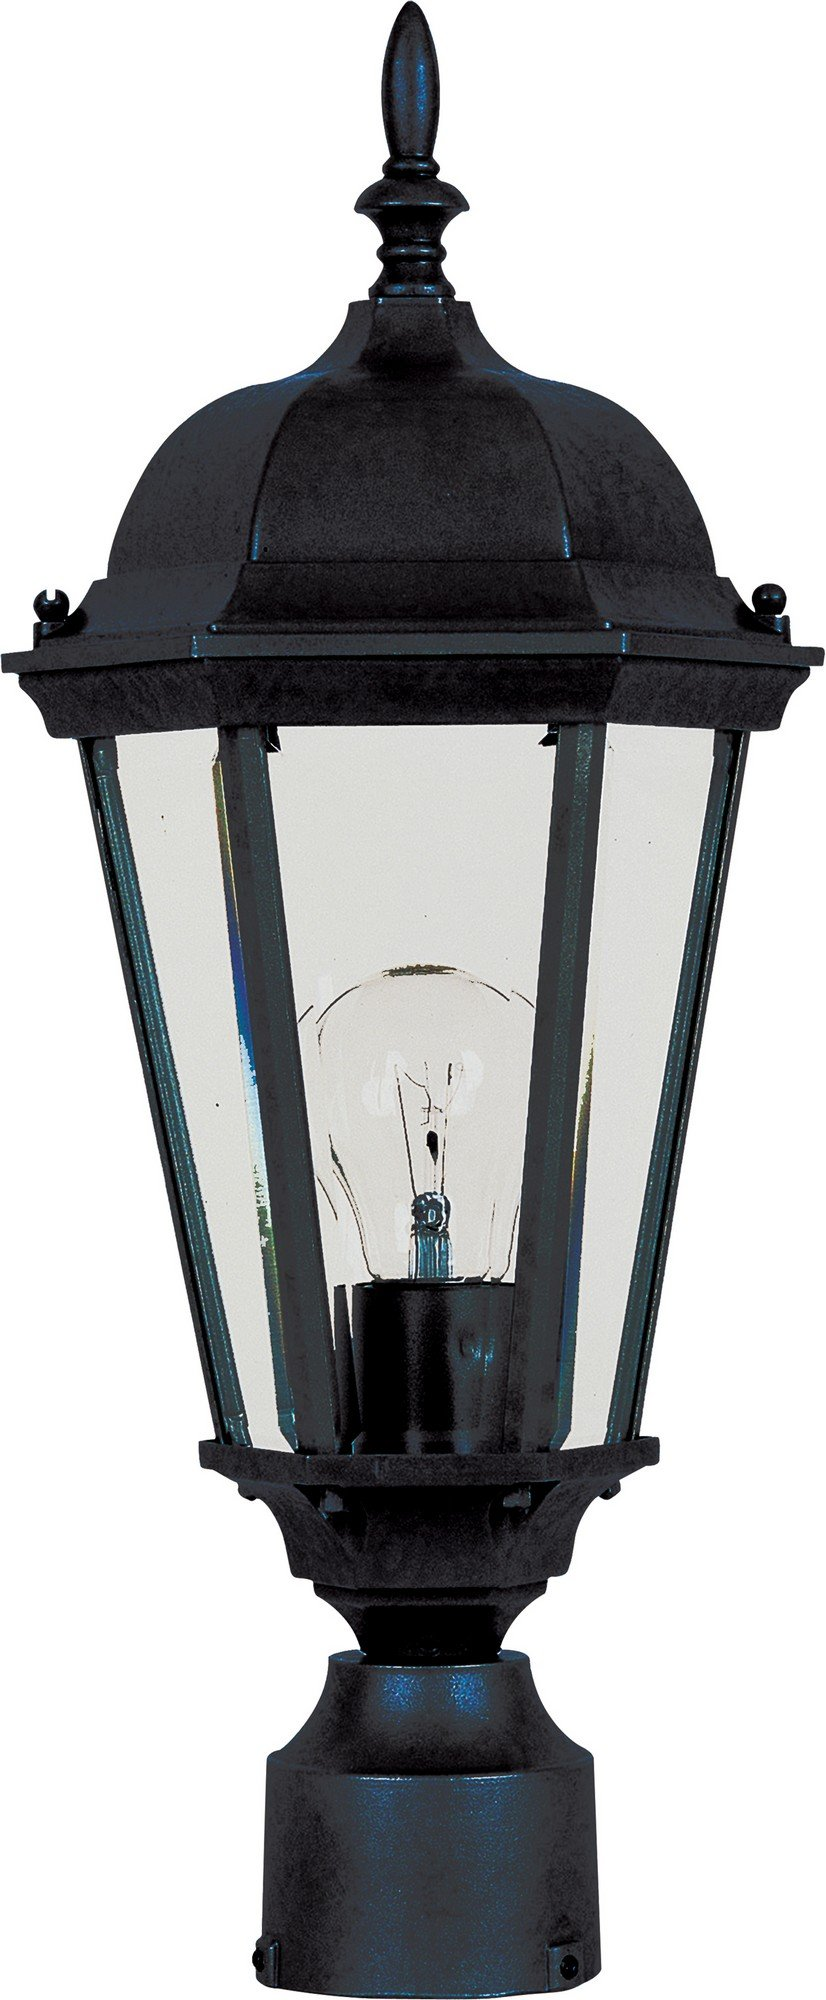 Maxim 1001BK, Westlake Cast, 1 Light Outdoor/Post Lantern, Black